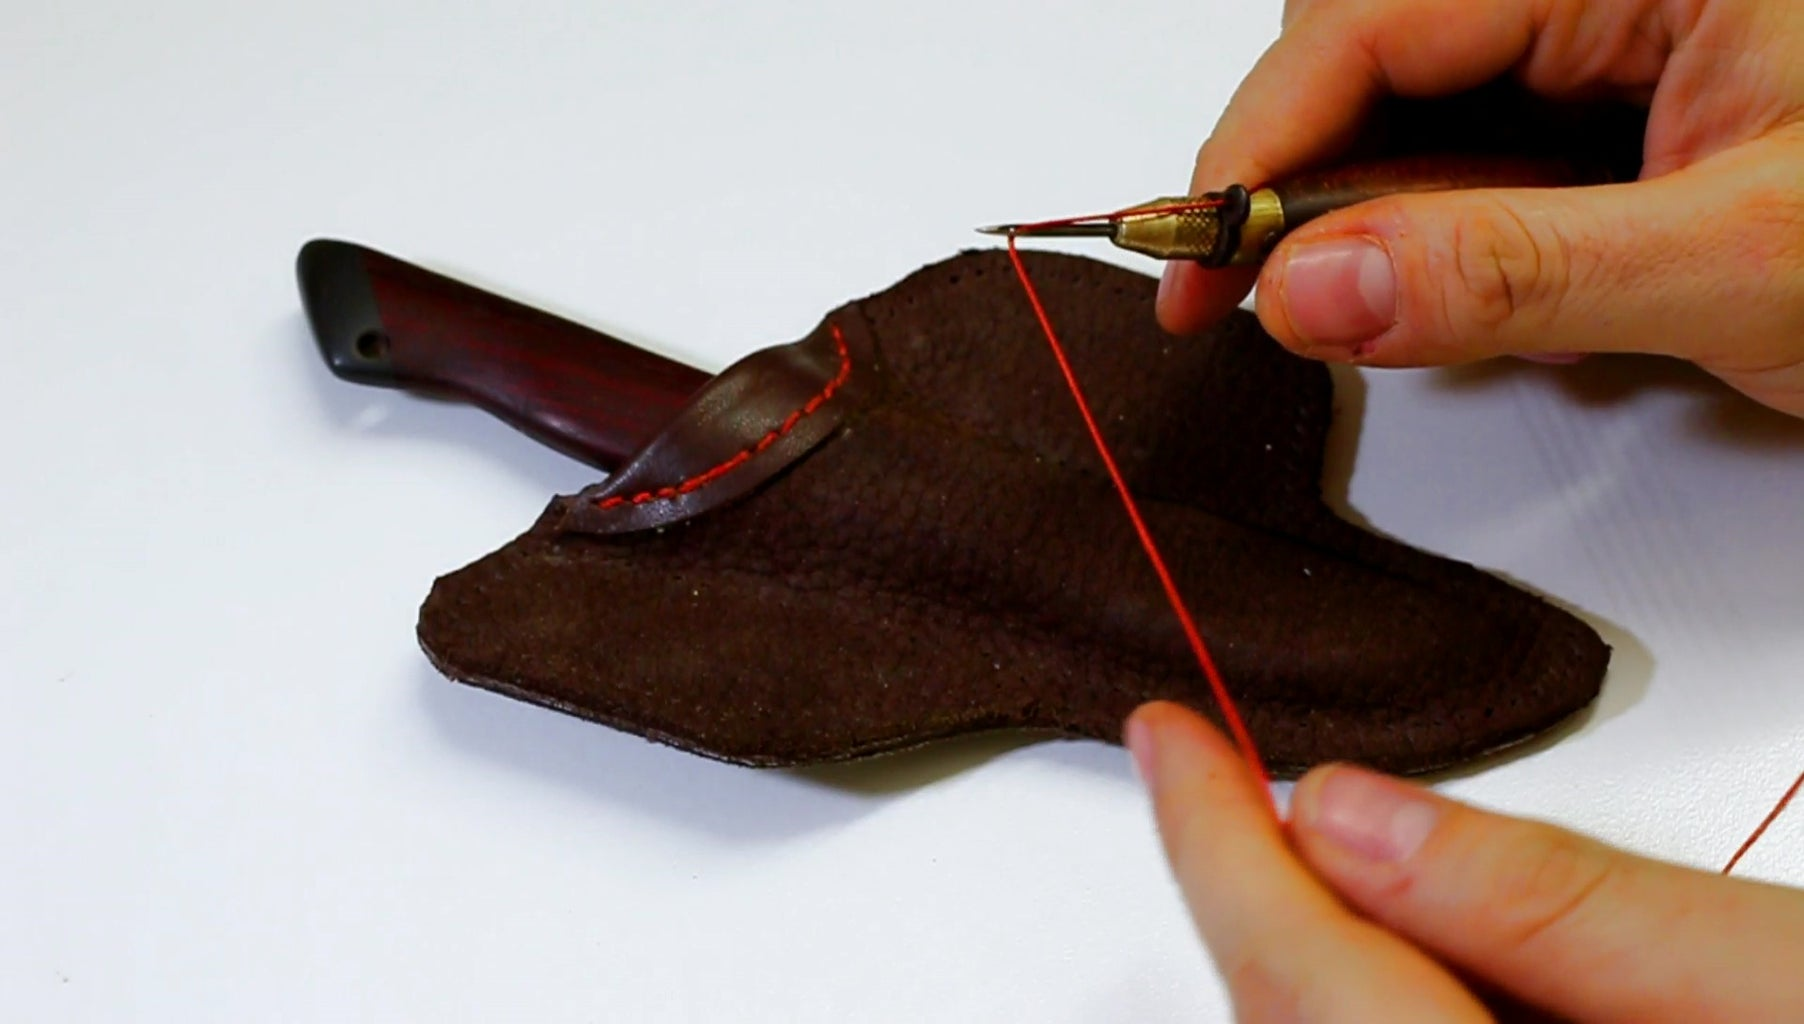 Sewing the Sheath